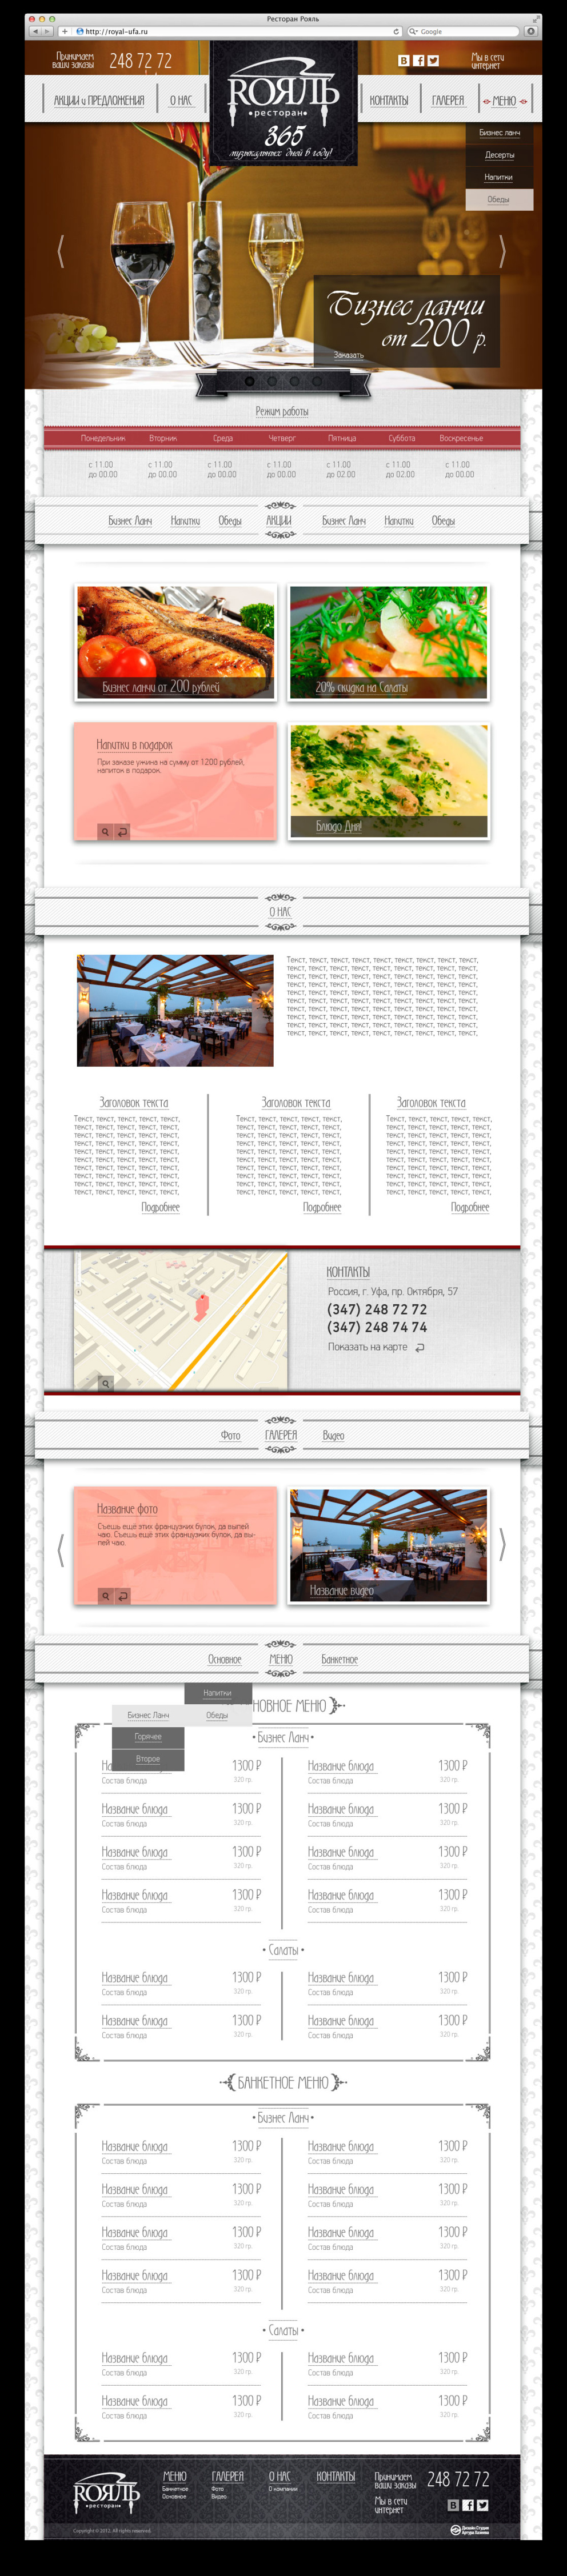 Промо сайт ресторана Рояль / Проект компании Дизайн Студия Артура Хазеева